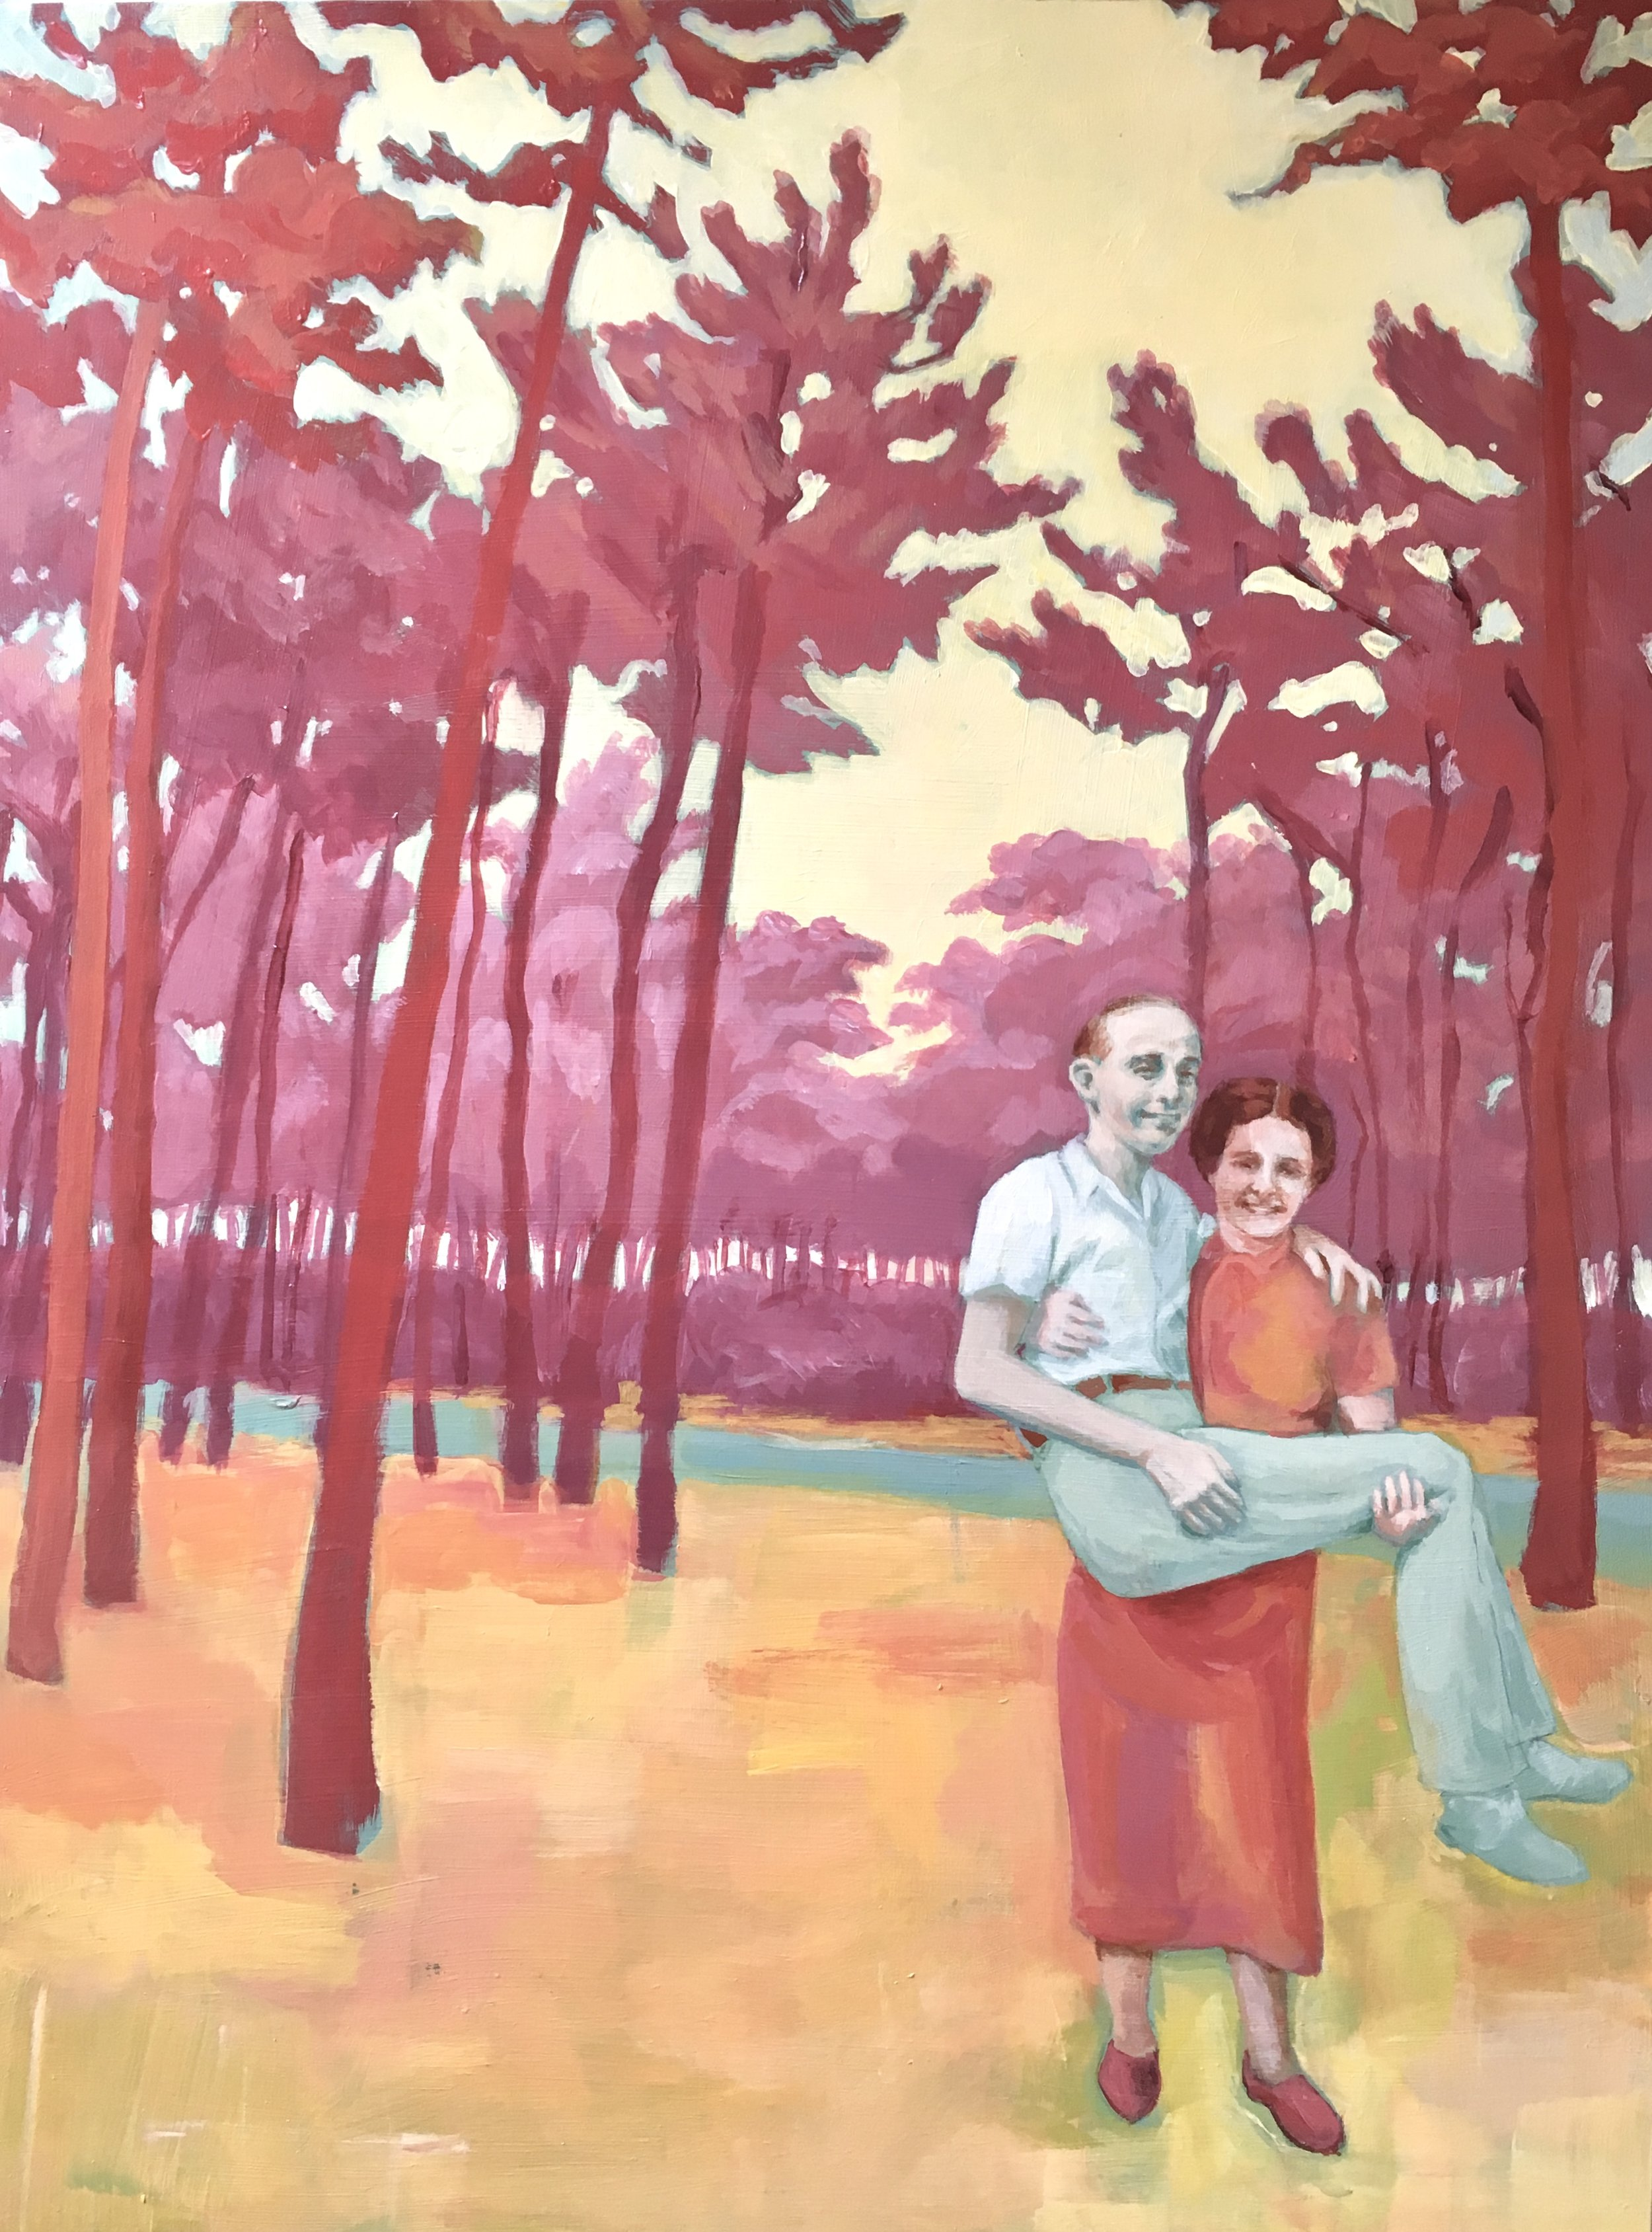 Lucy Gresley, Lucy Gresley, Patient, Acrylic on wooden panel, 40 x 30 x 2 cm,  https://www.lucygresley.com